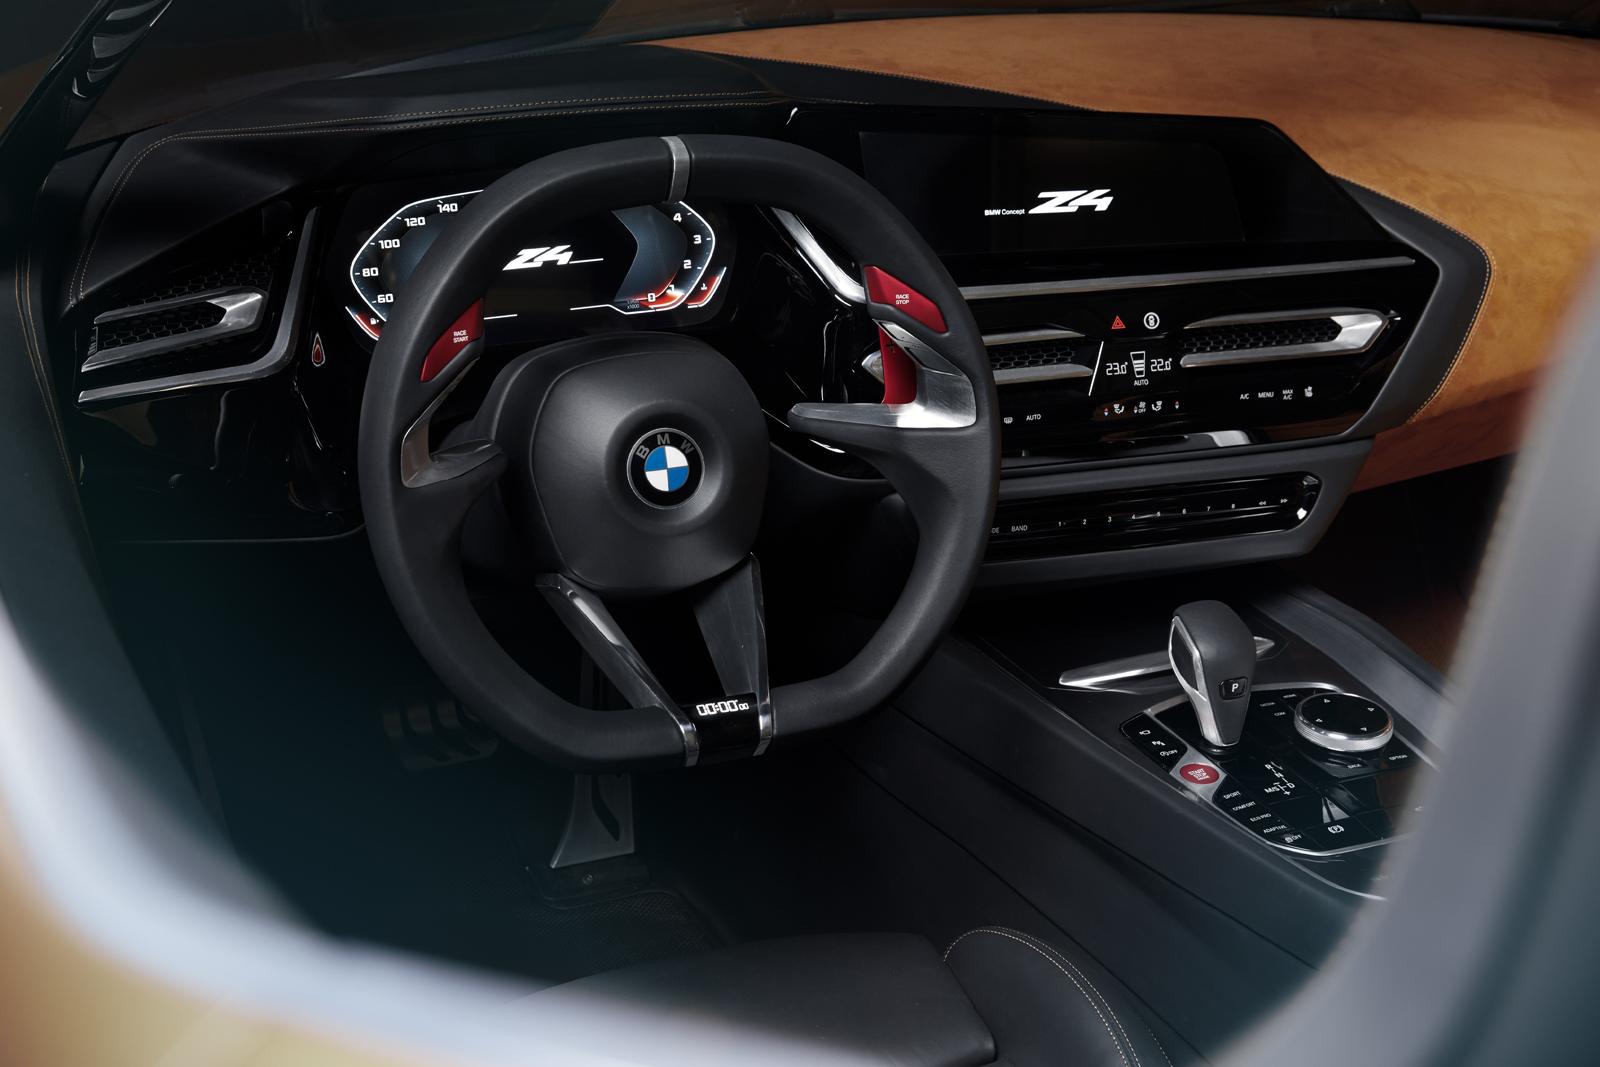 BMW_DCC070_02.jpg